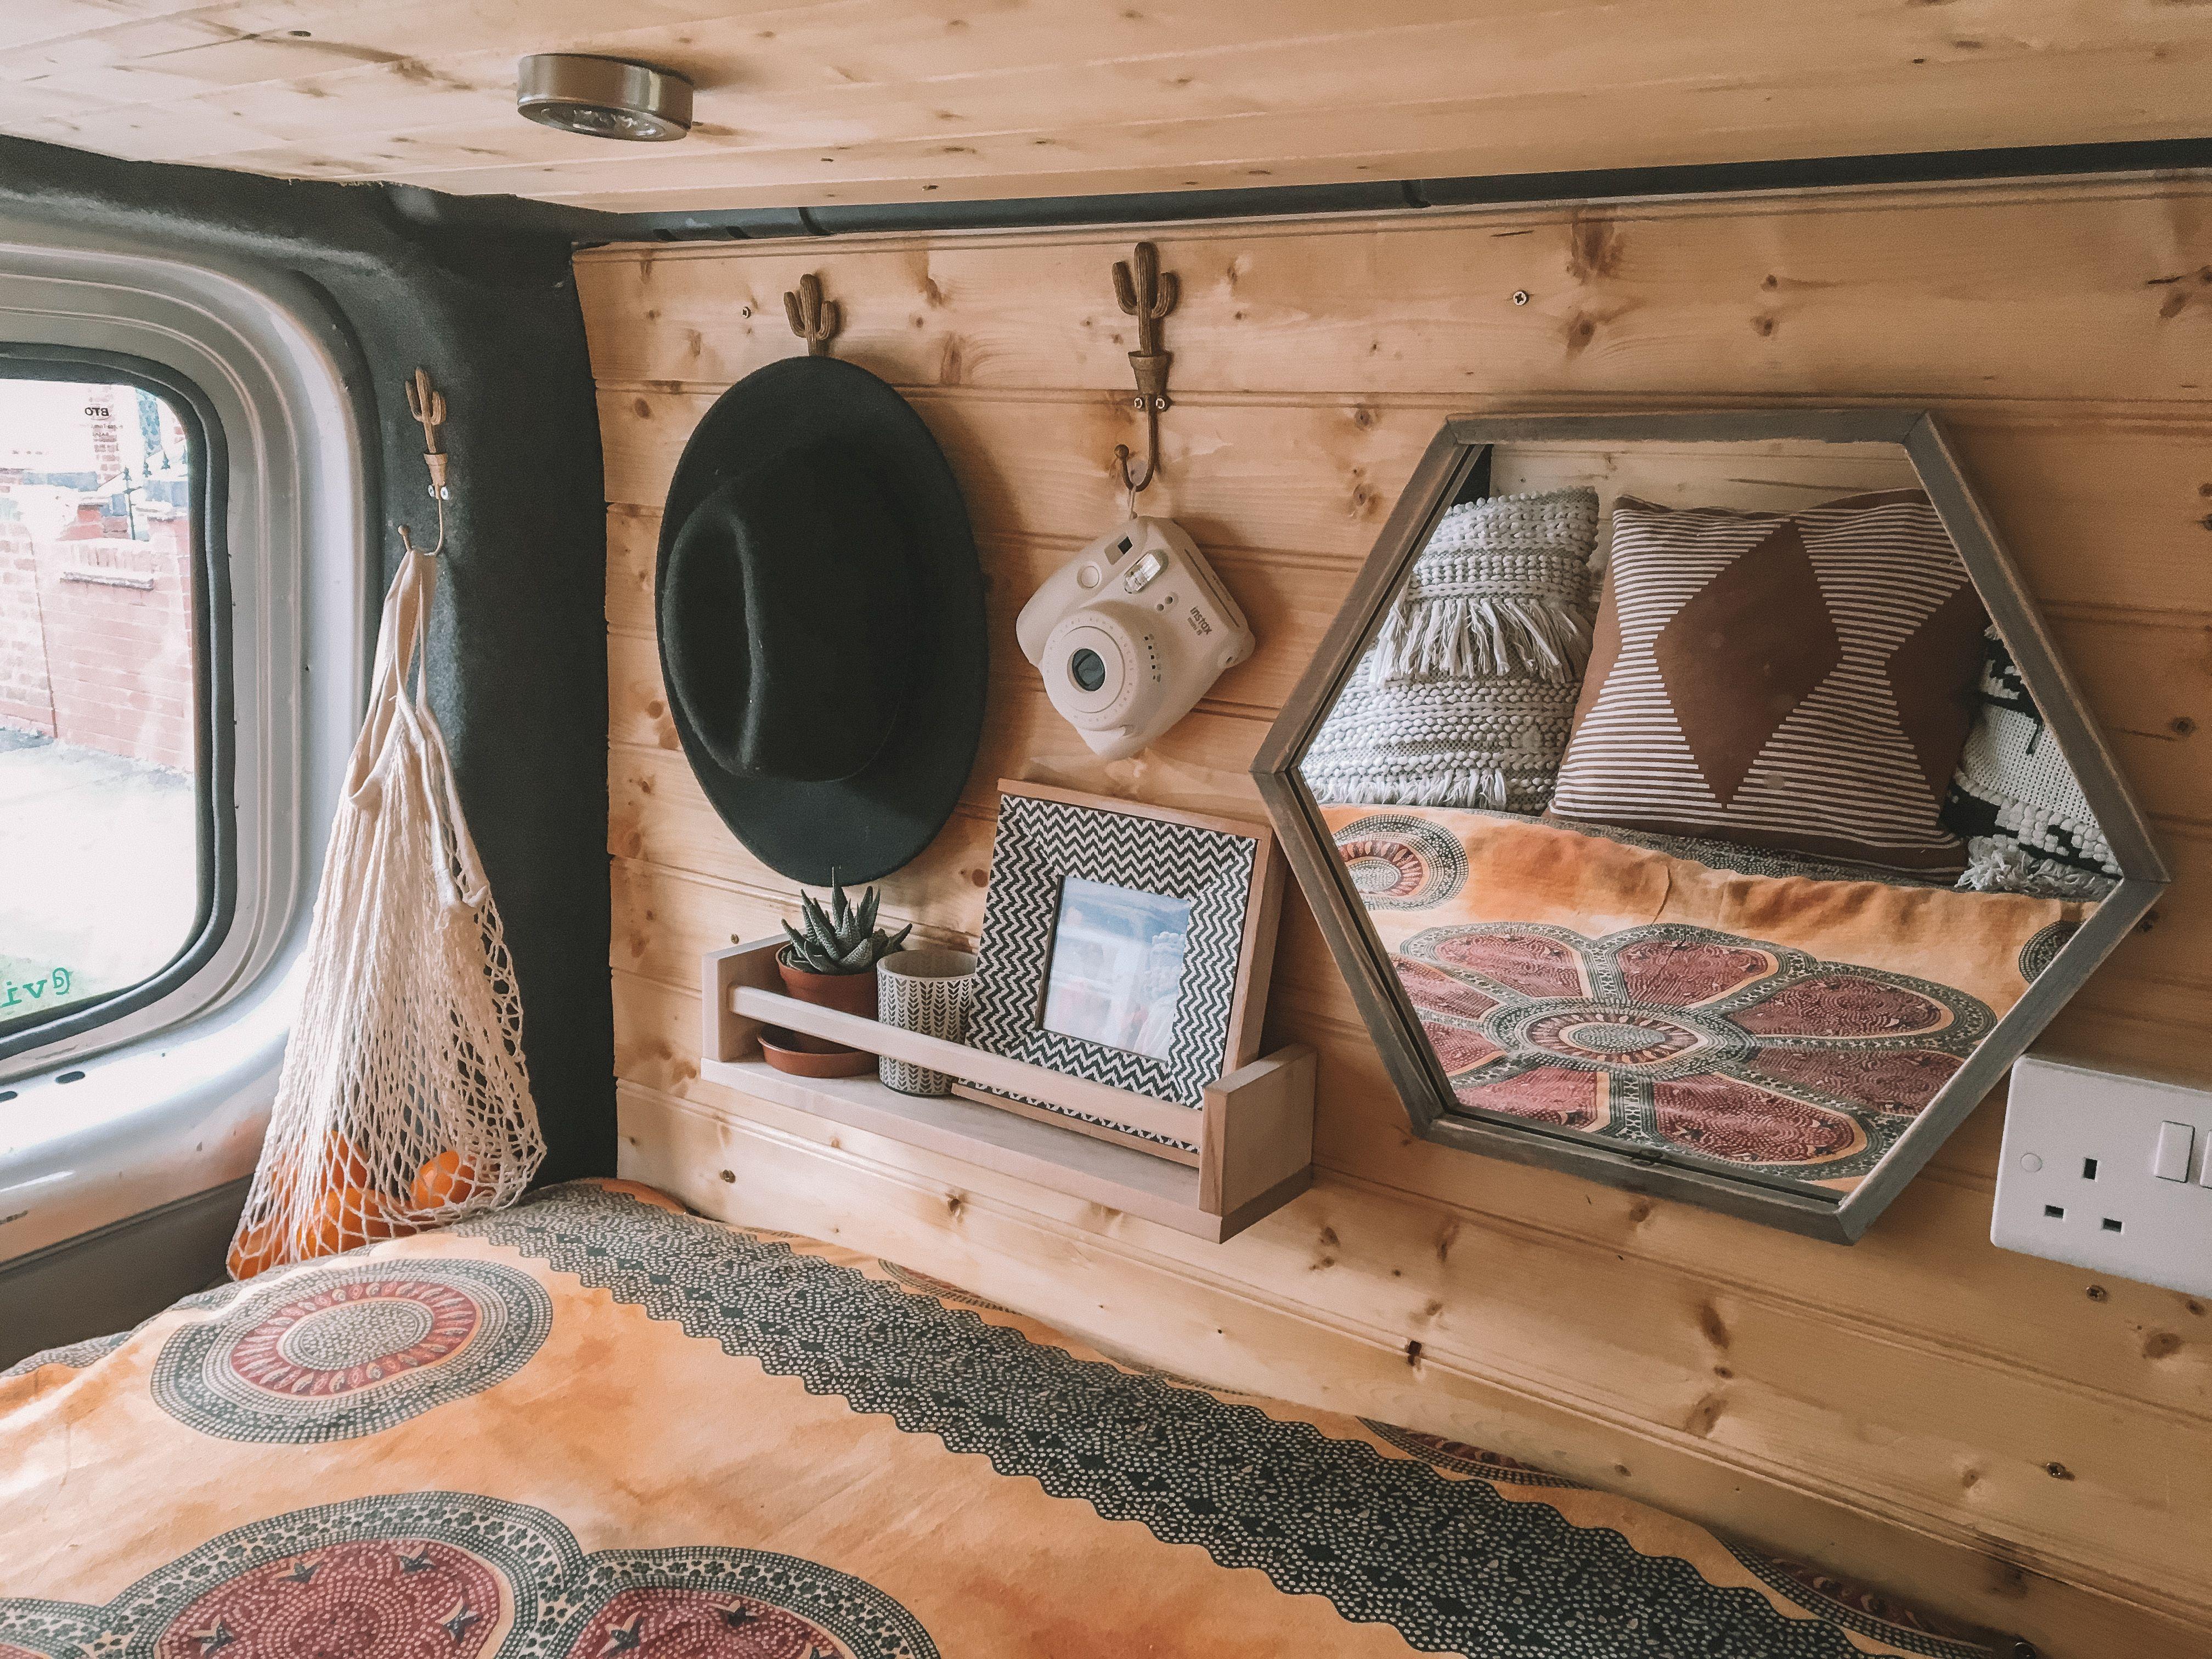 Van Life Camper Conversion - Campers - Traveling -